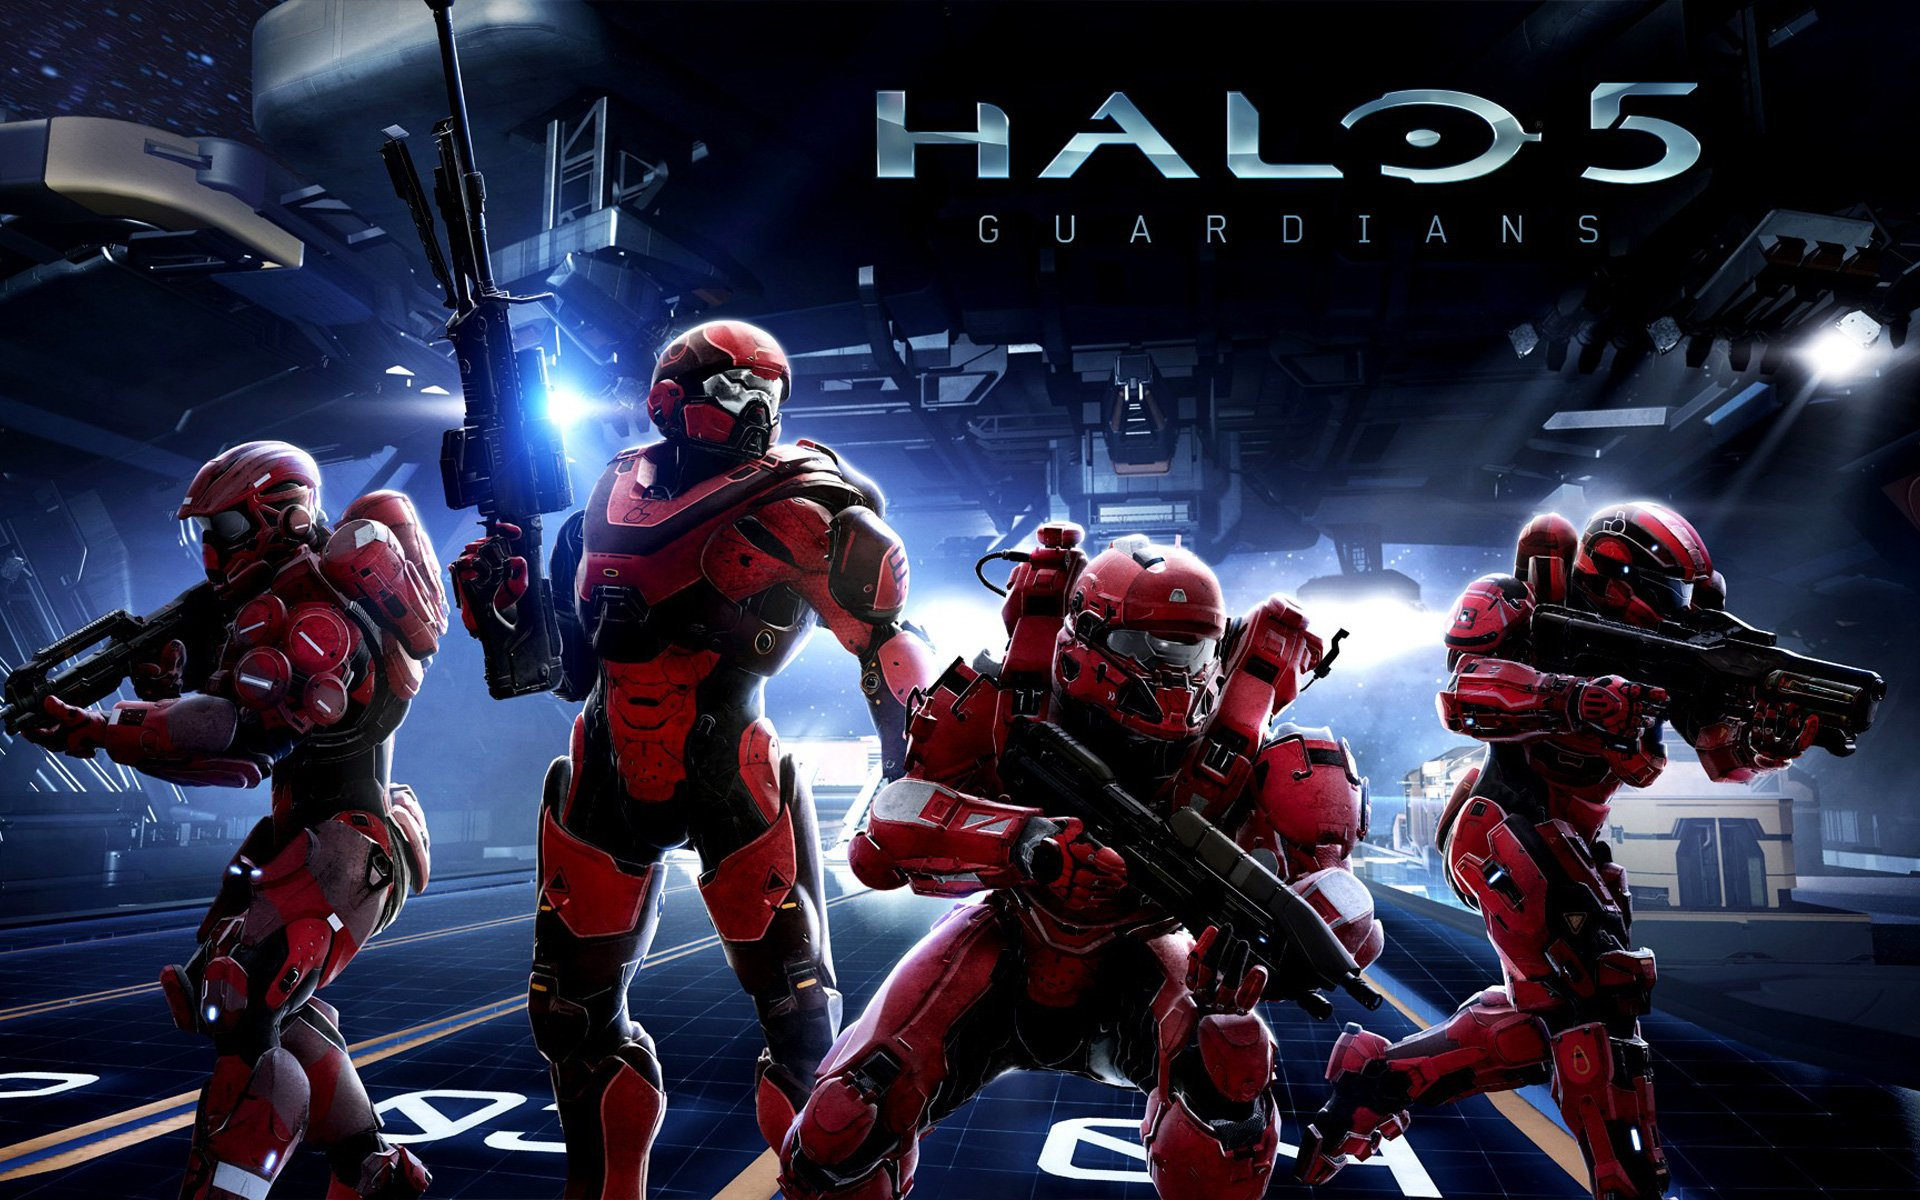 Halo 5 guardians full hd fondo de pantalla and fondo de - Halo 5 guardians wallpaper 1920x1080 ...